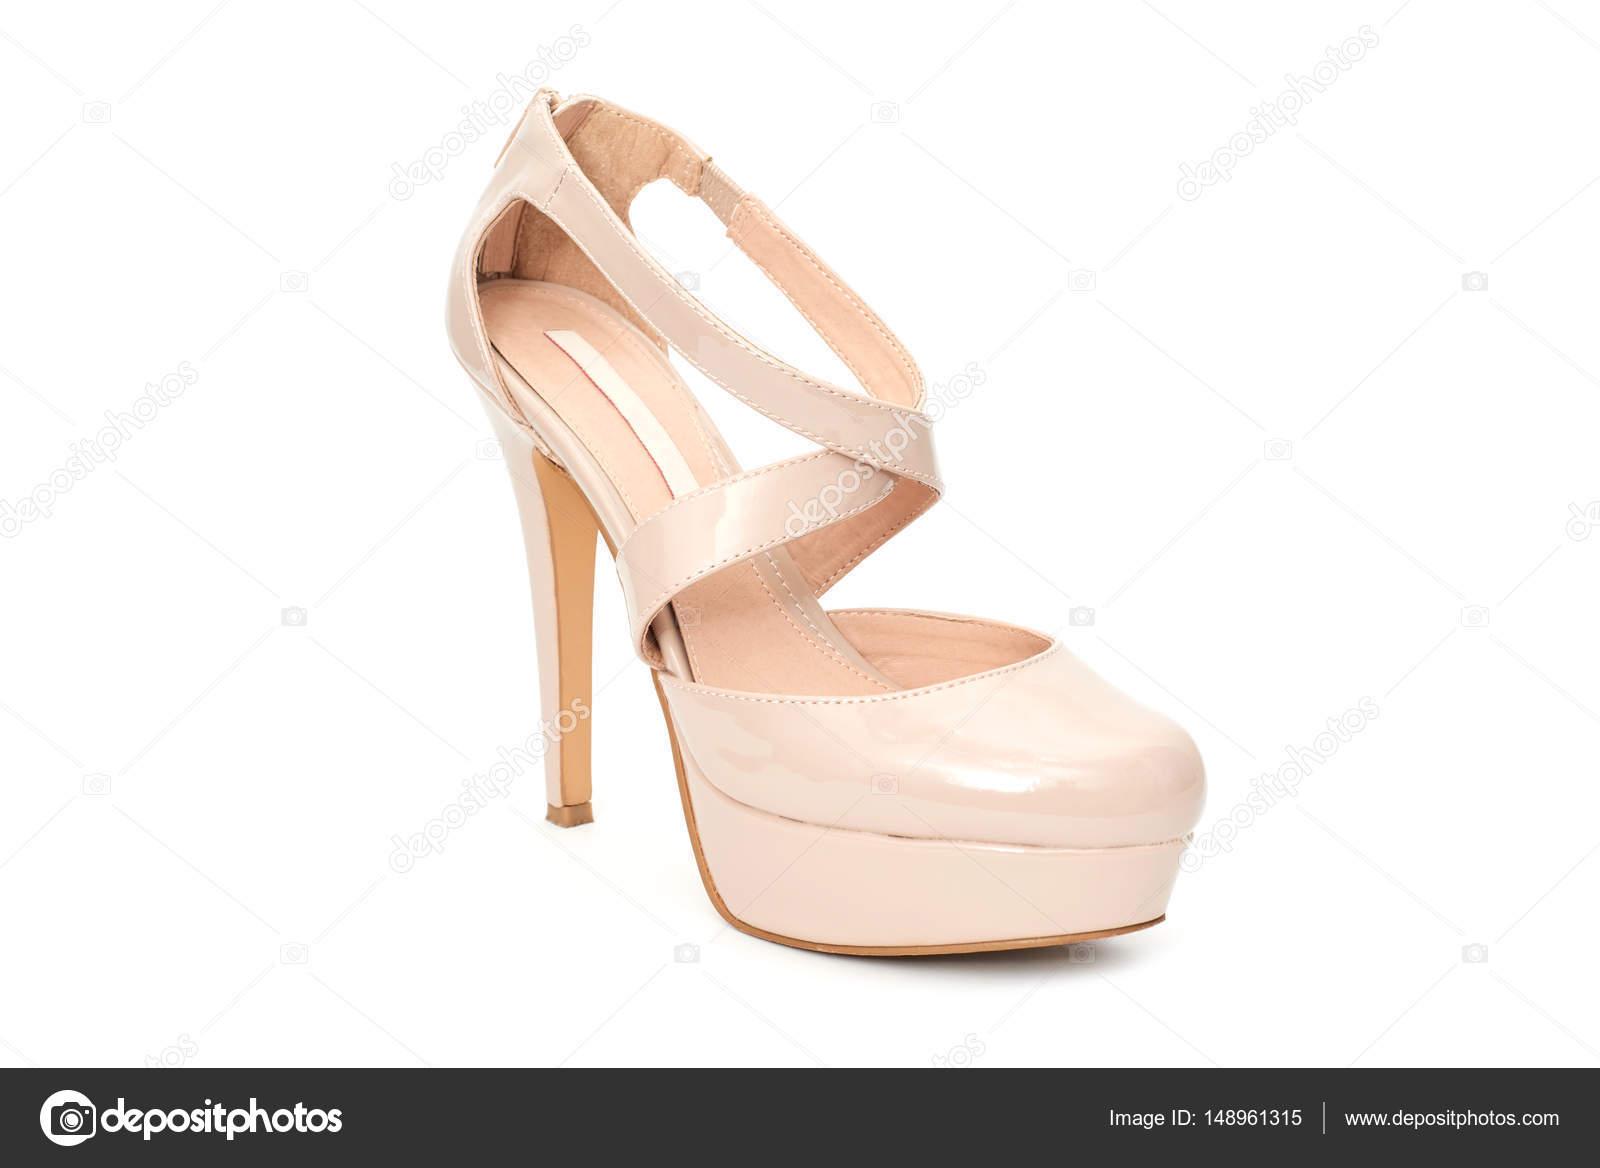 200619b1836 Μπεζ γόβες γυναίκα παπούτσι που απομονώνονται σε λευκό φόντο — Φωτογραφία  Αρχείου